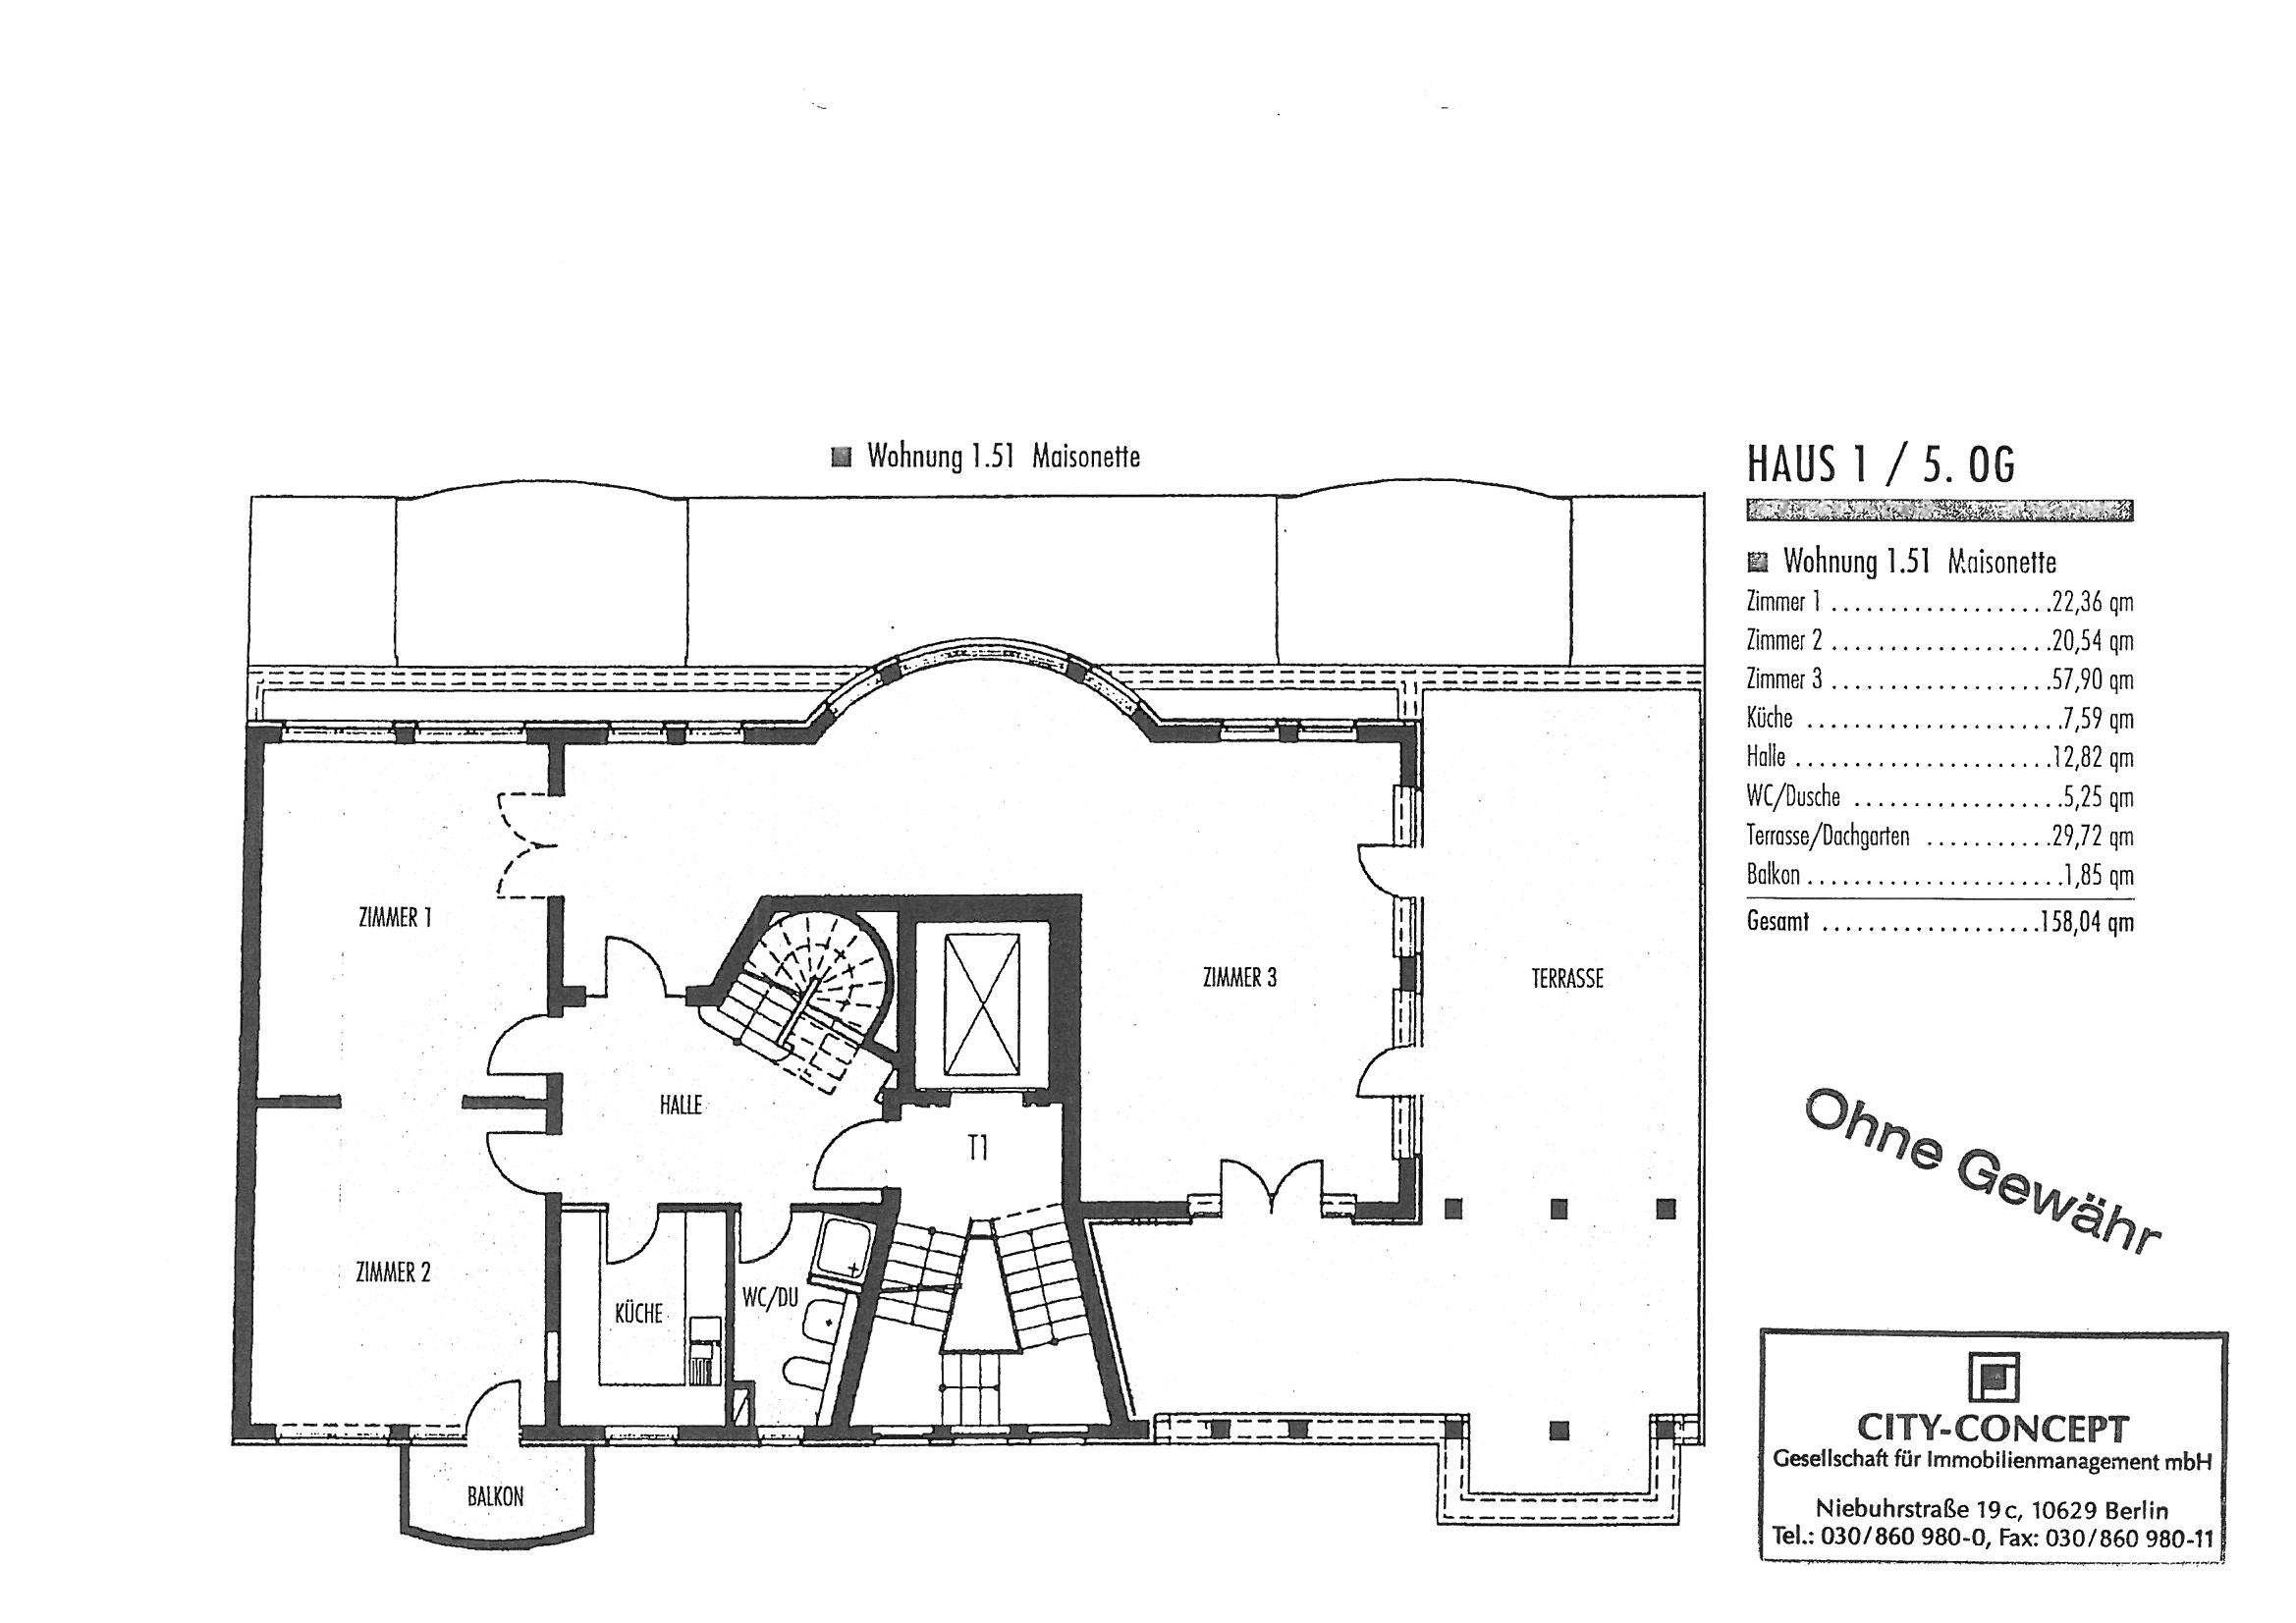 Grundriss Penthouse 1.51 Ebene